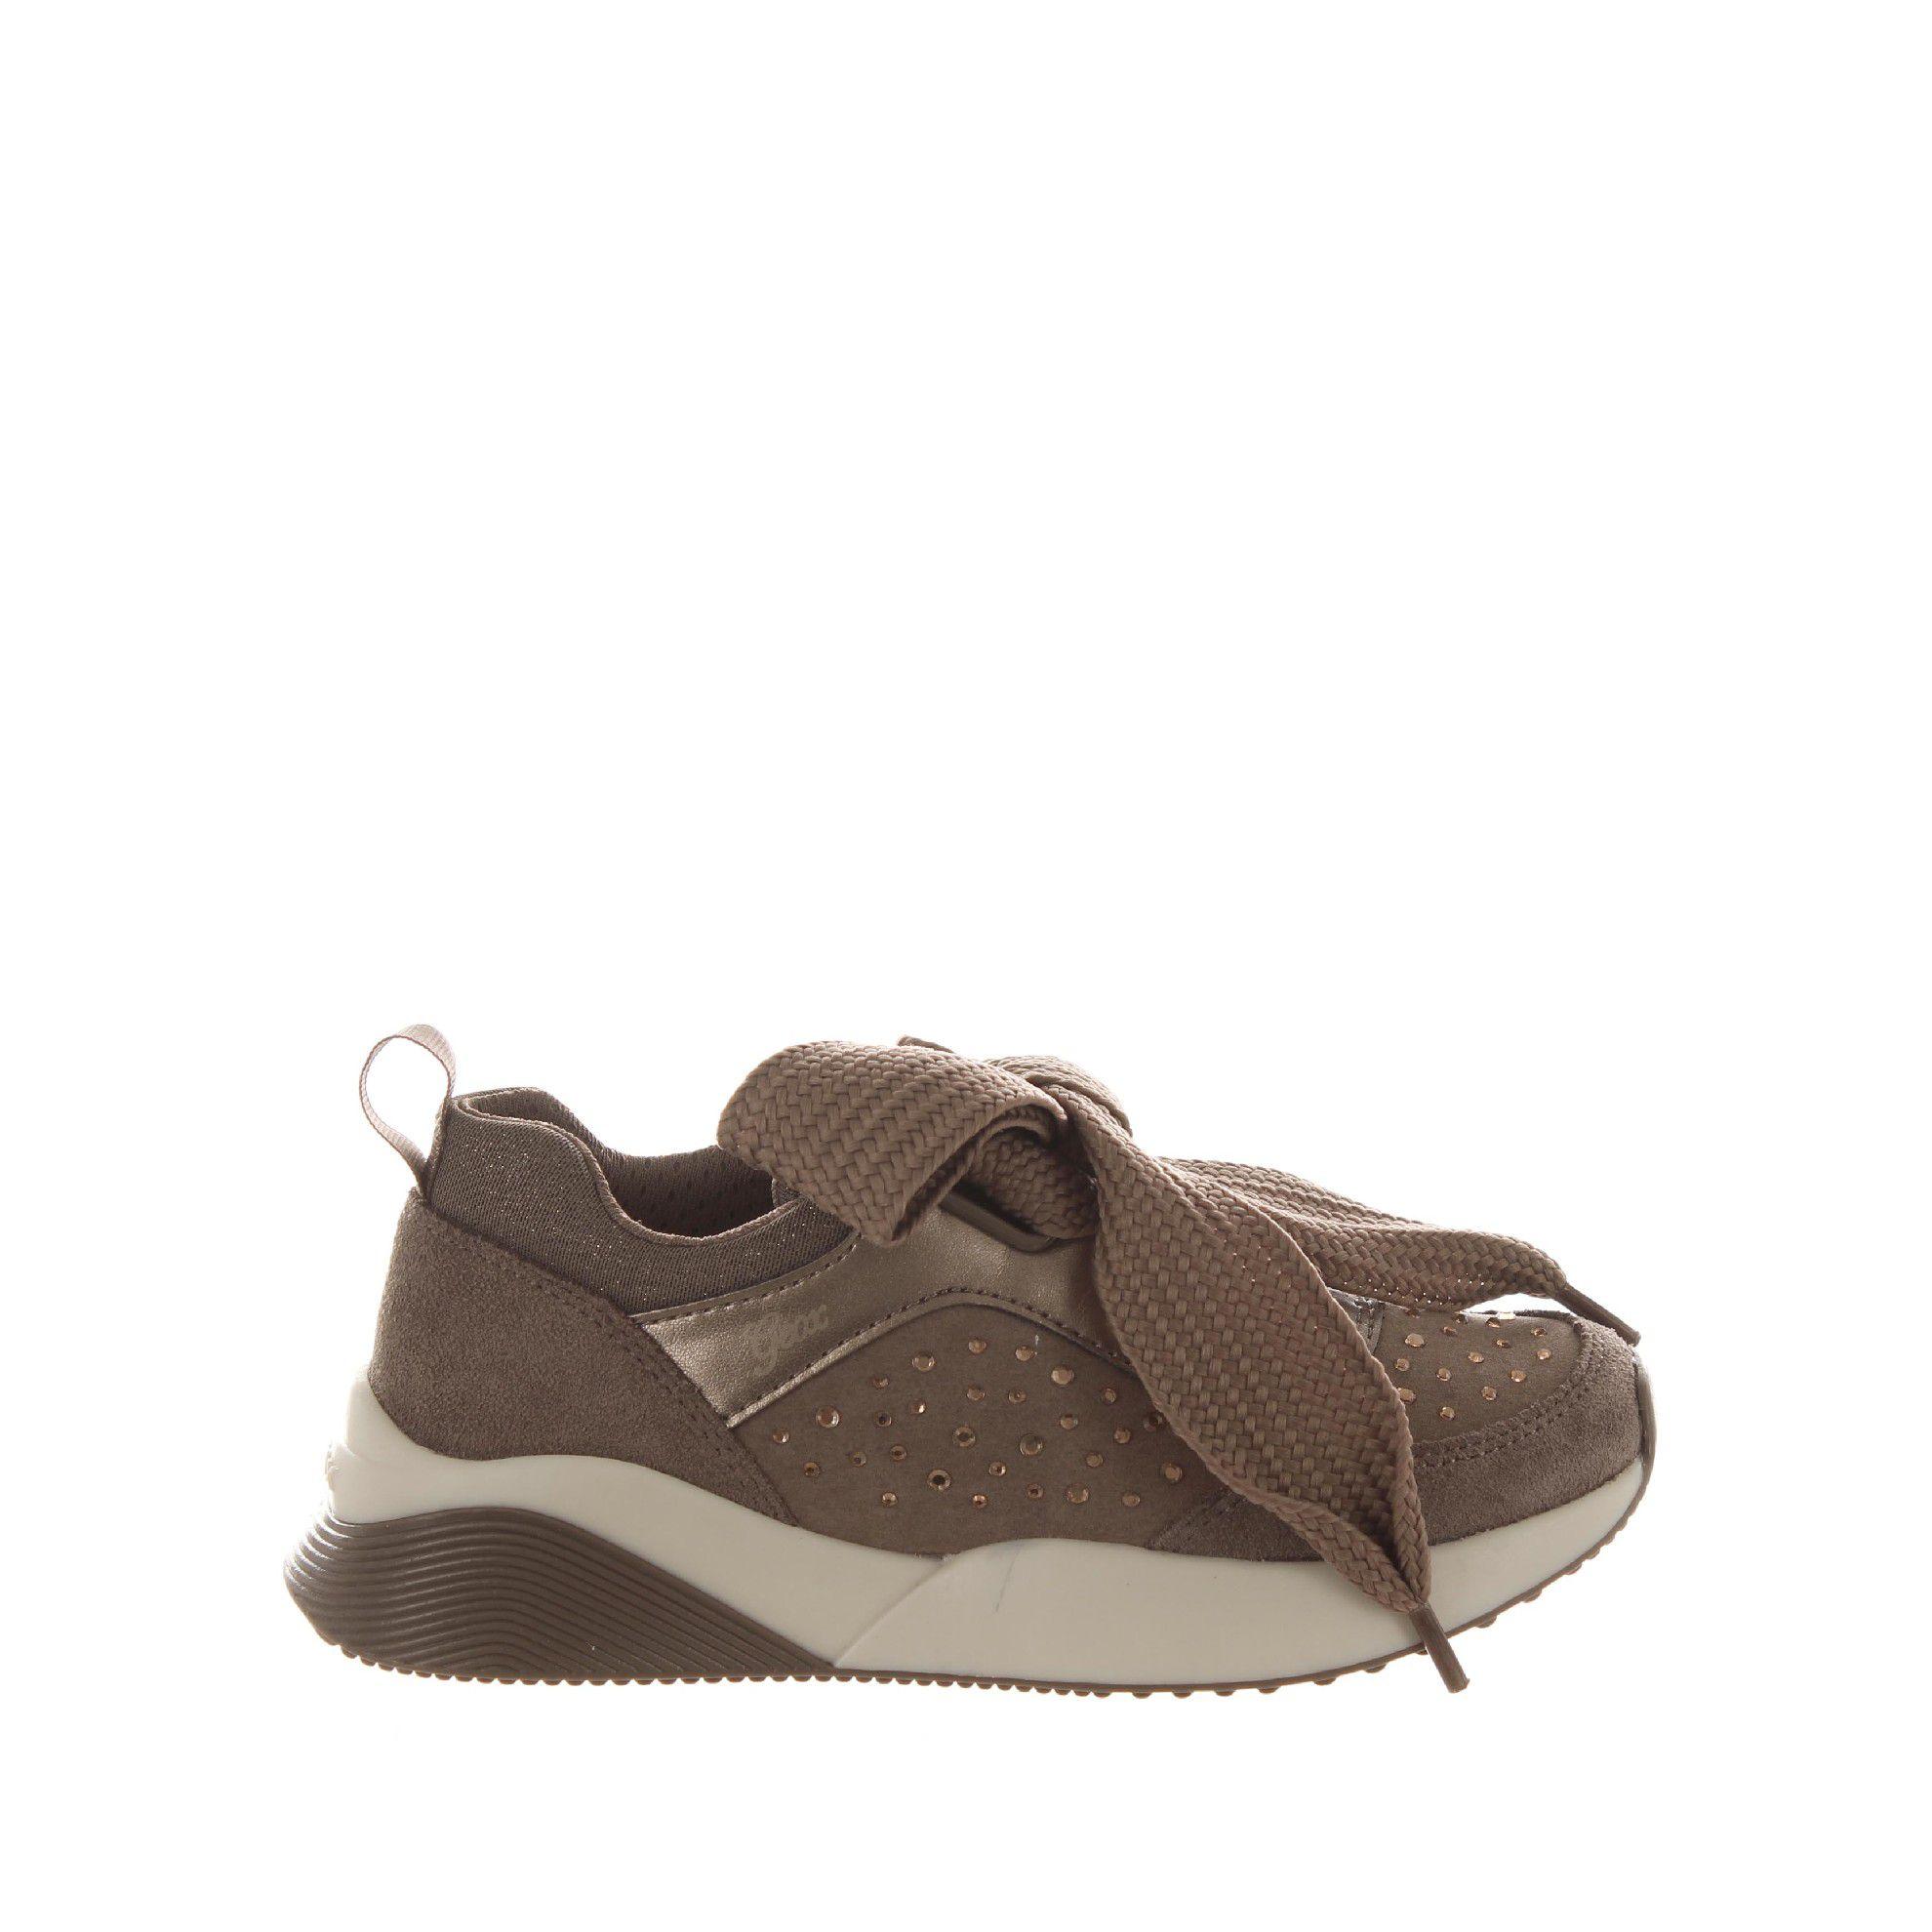 Geox sneaker sinead in suede da bambina